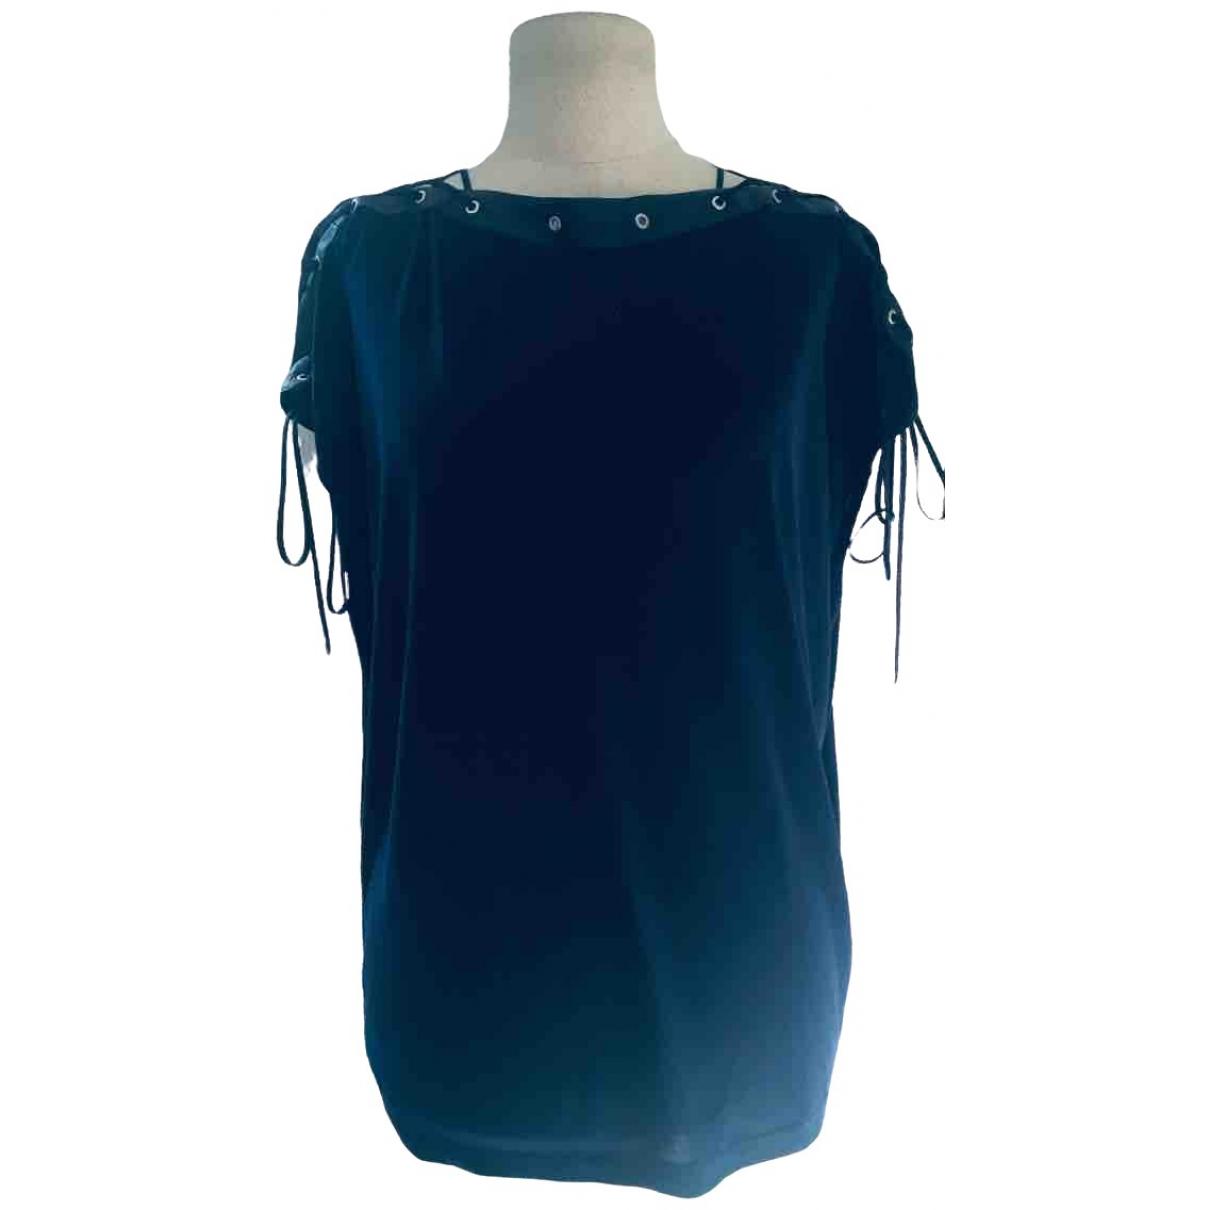 Mcm \N Navy Cotton  top for Women L International